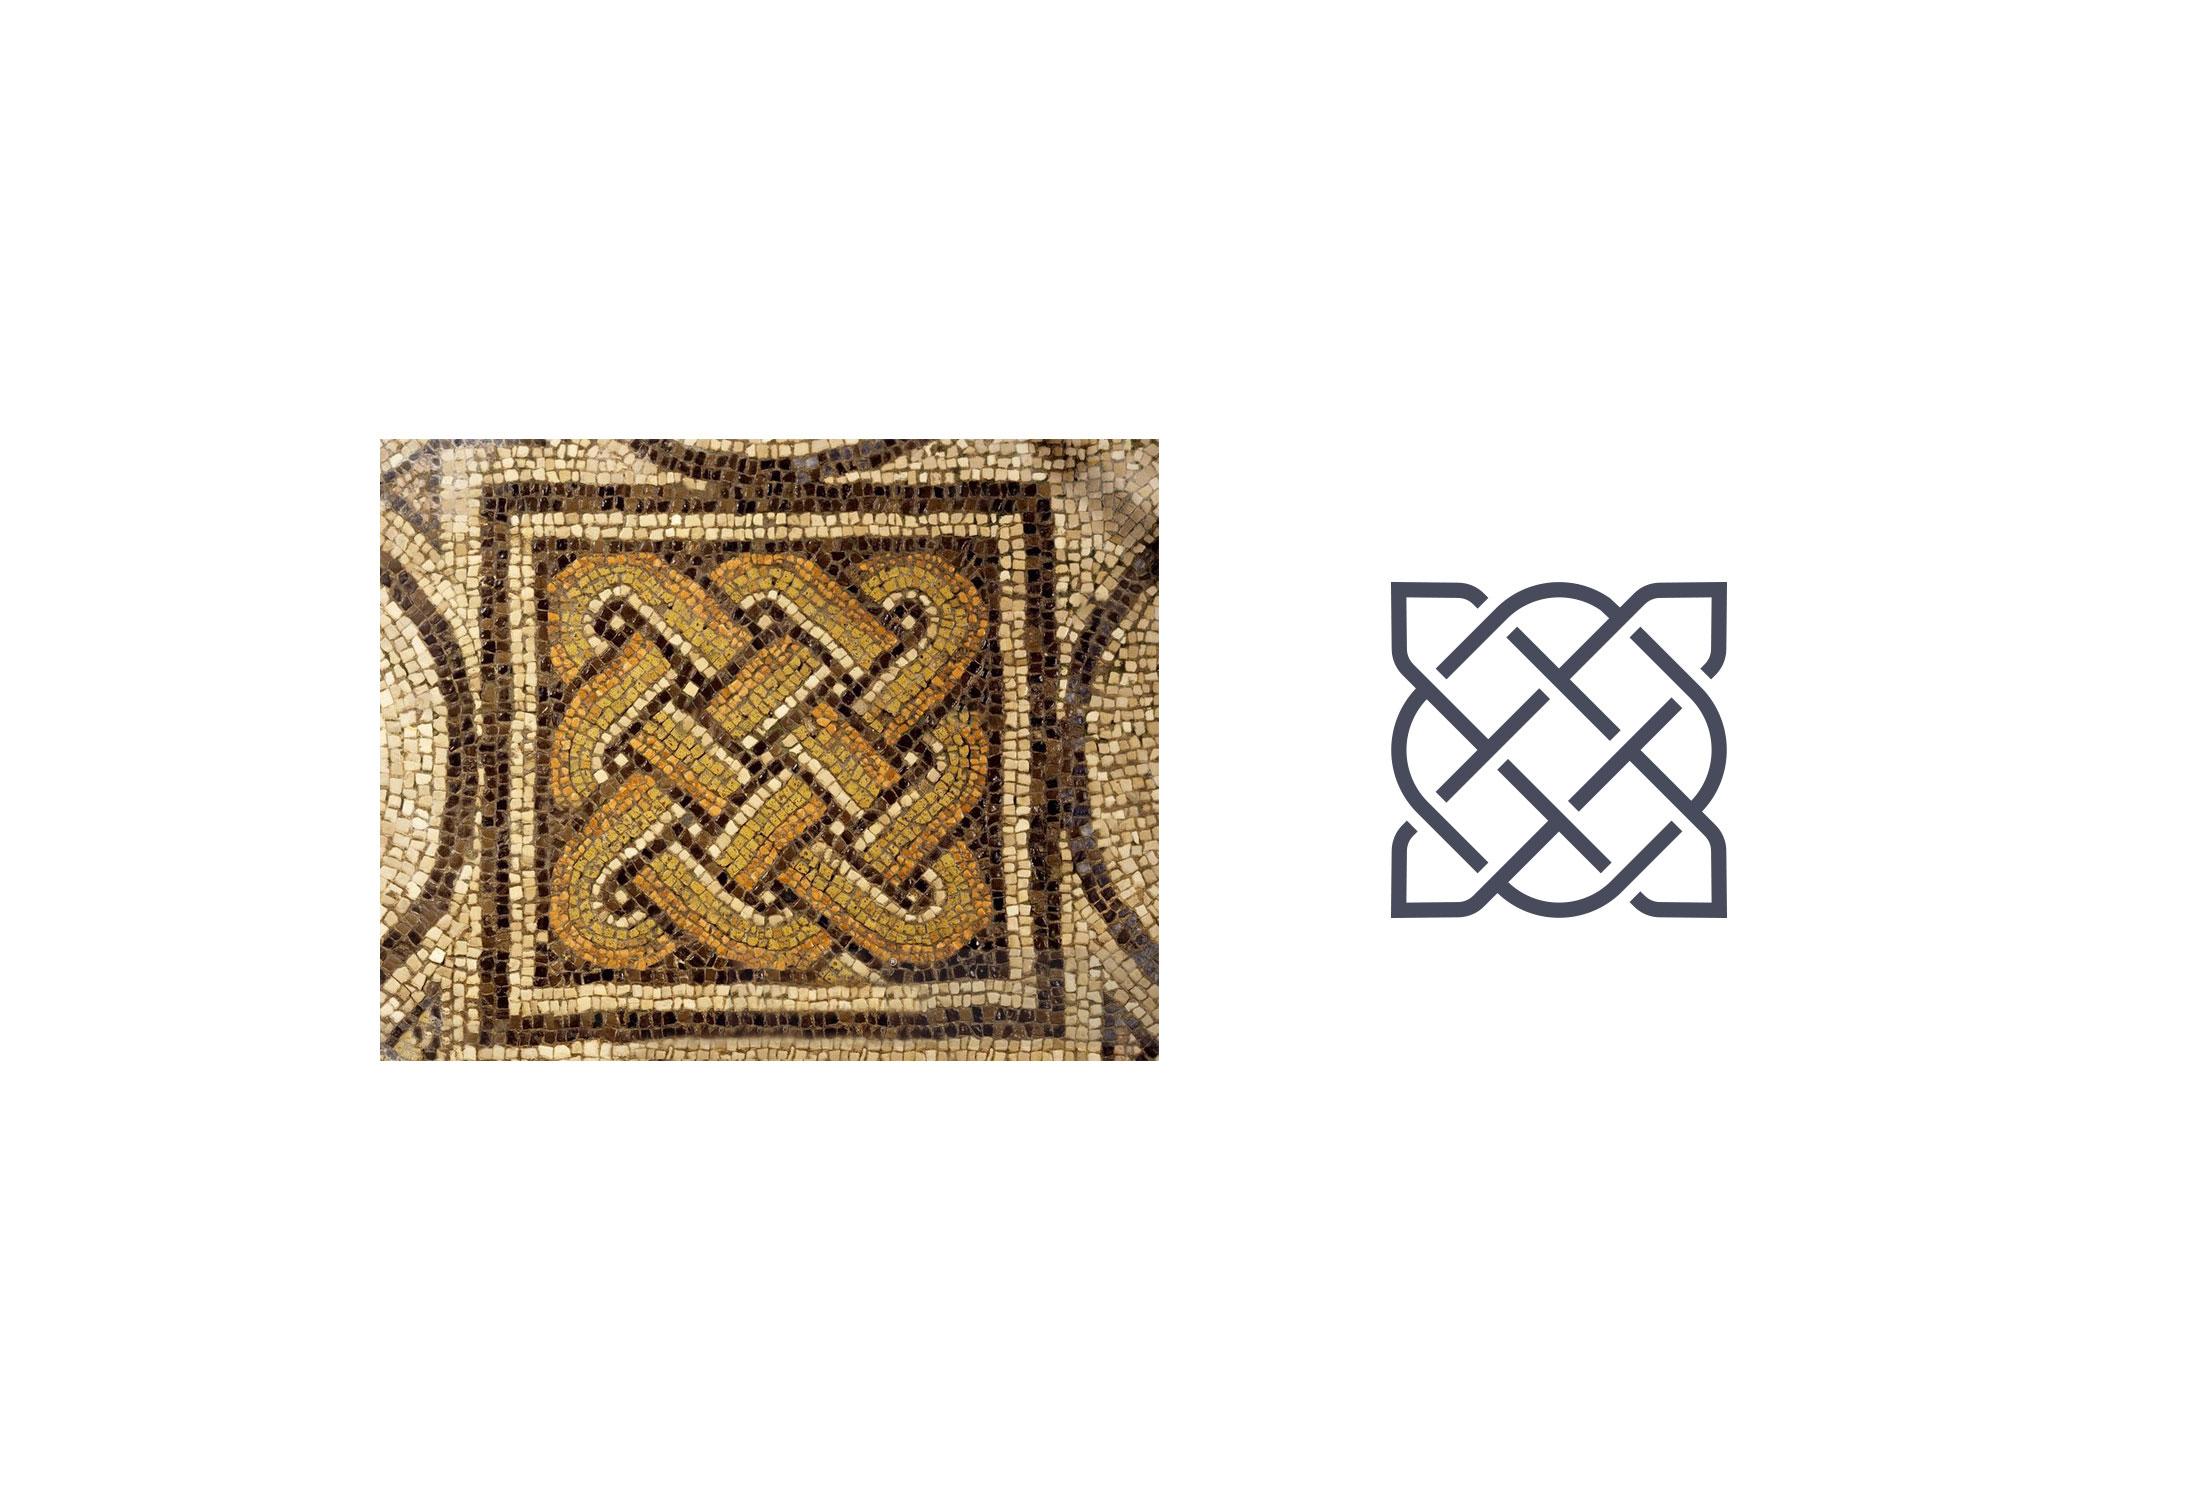 Sophic logo rationale